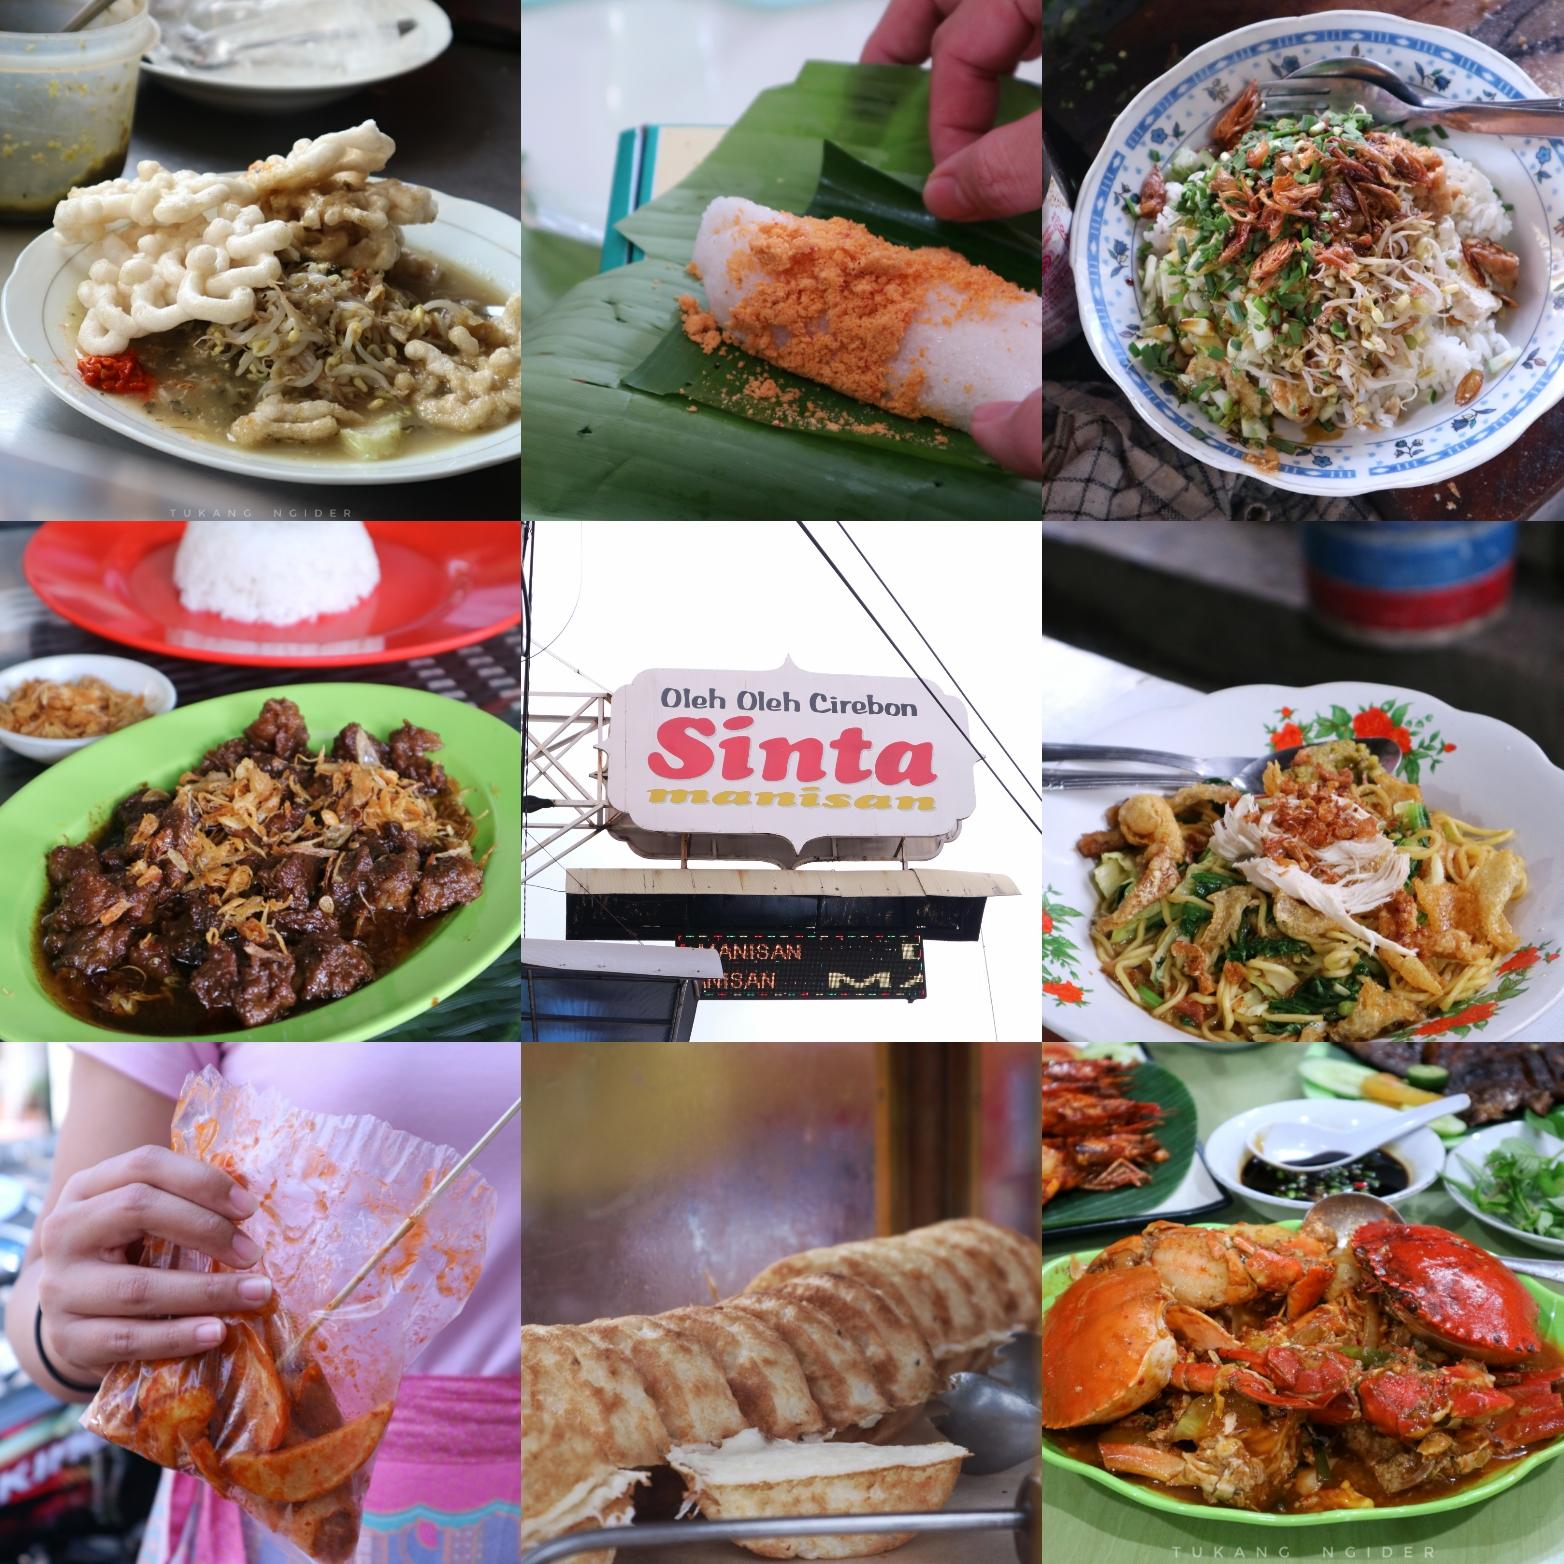 32 Rekomendasi Kuliner Cirebon Yang Wajib Dicoba Tukang Ngider